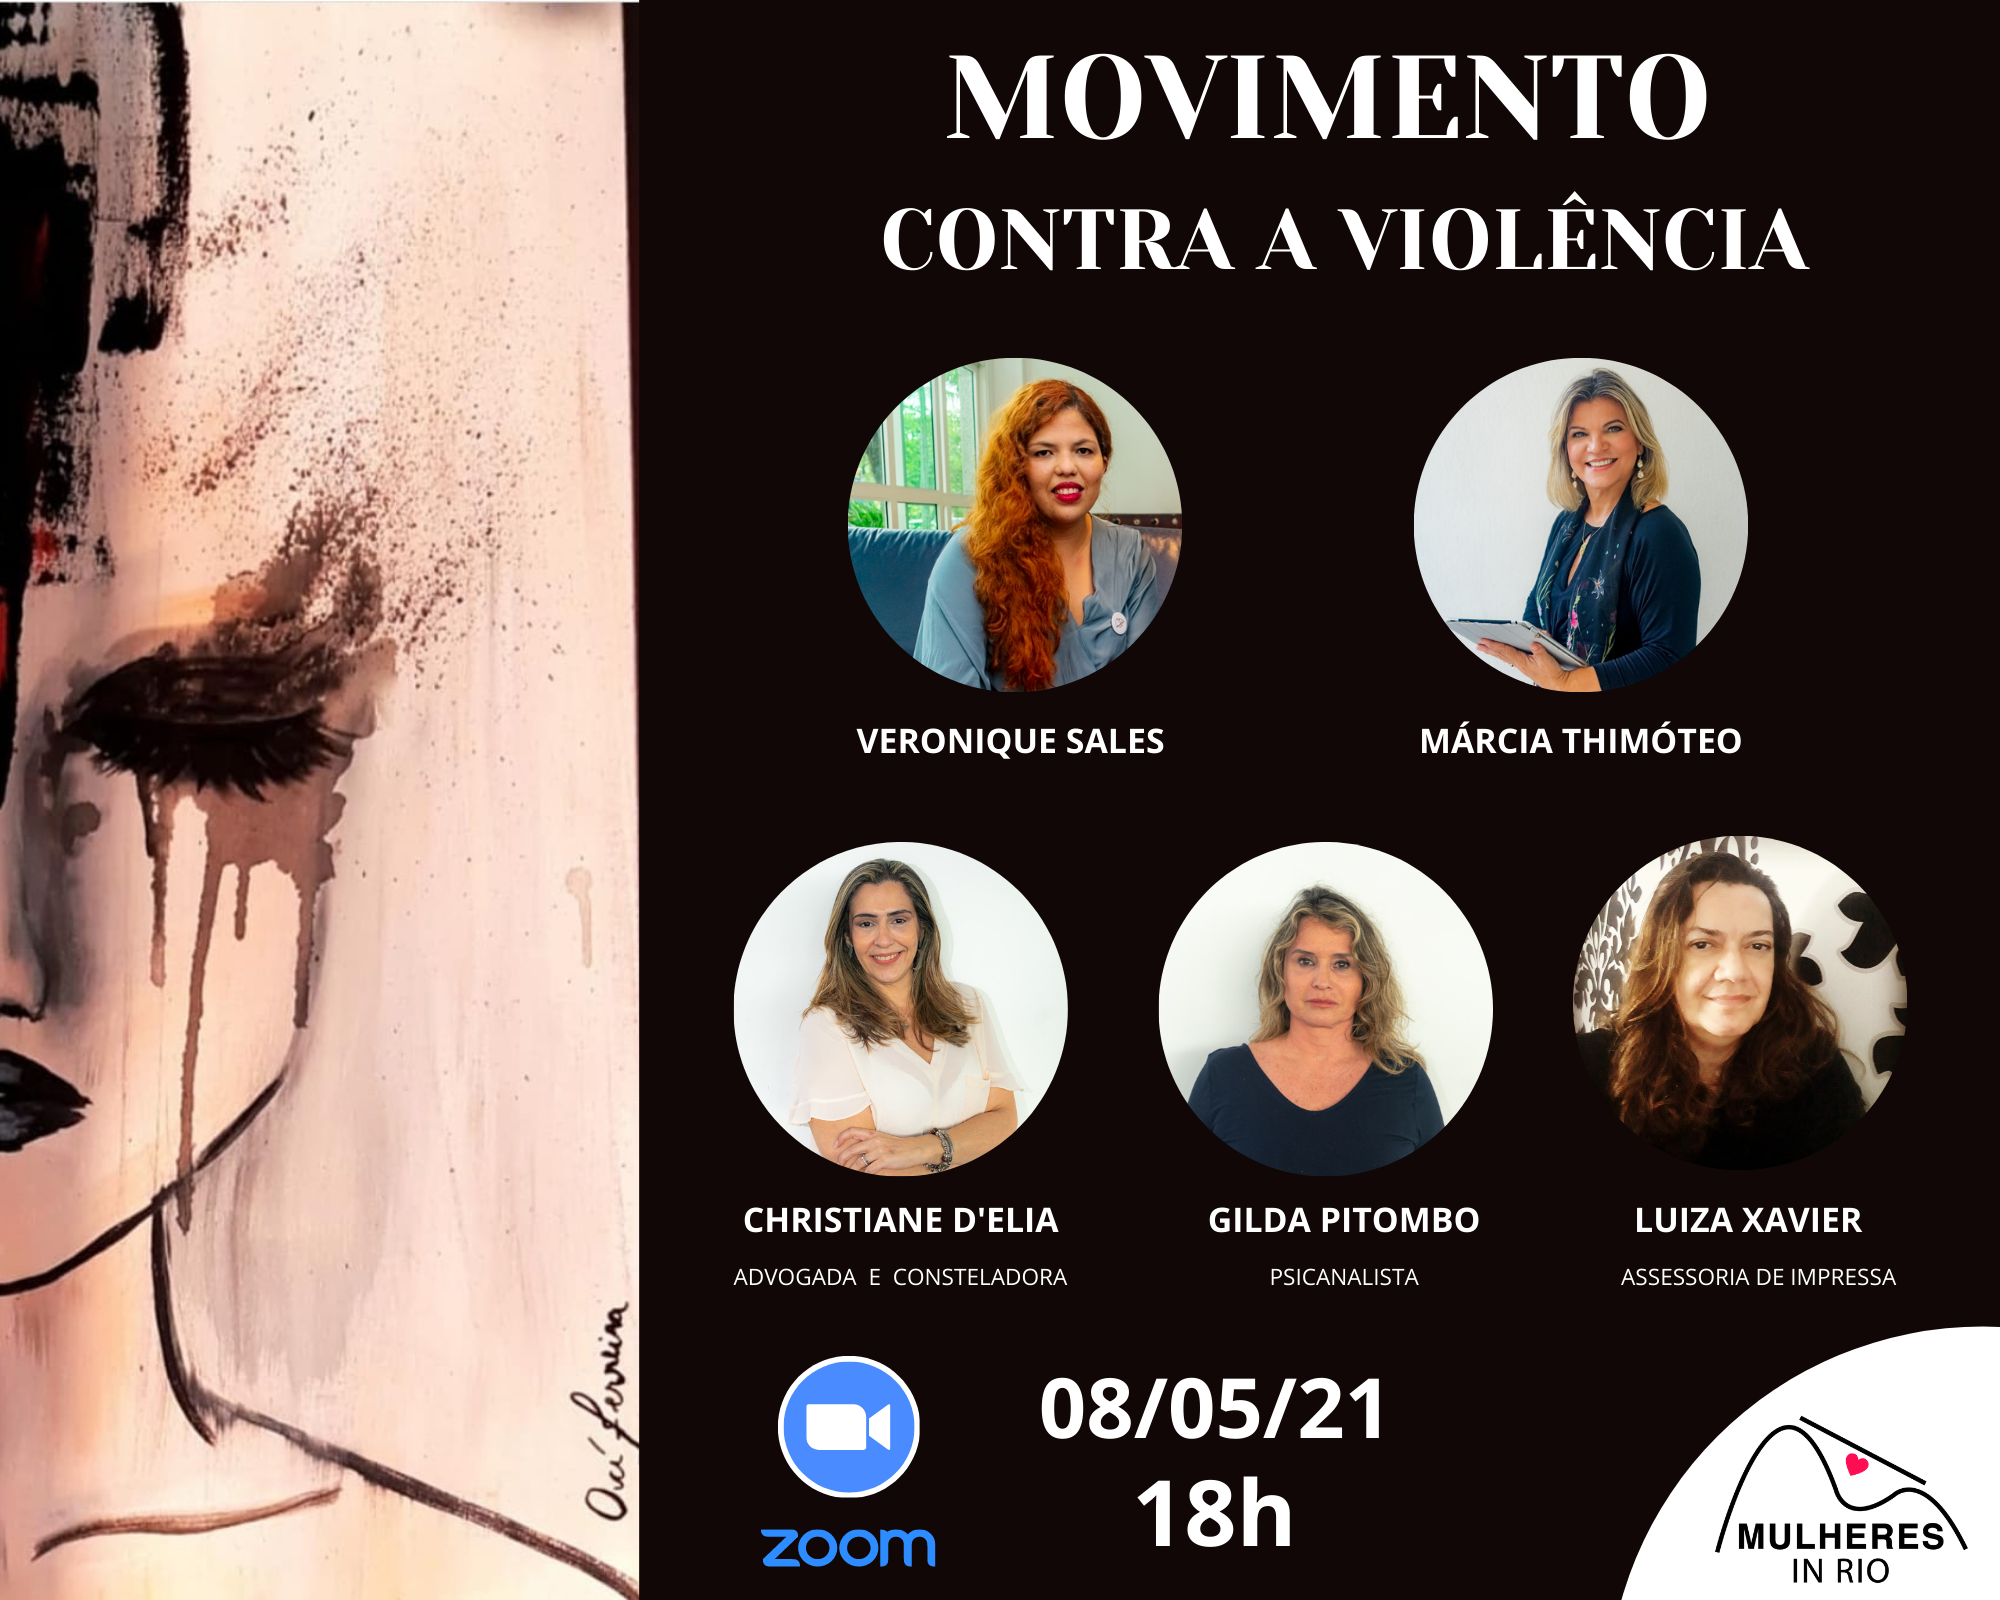 Movimento contra a violência Mulheres in Rio 2021 (2)